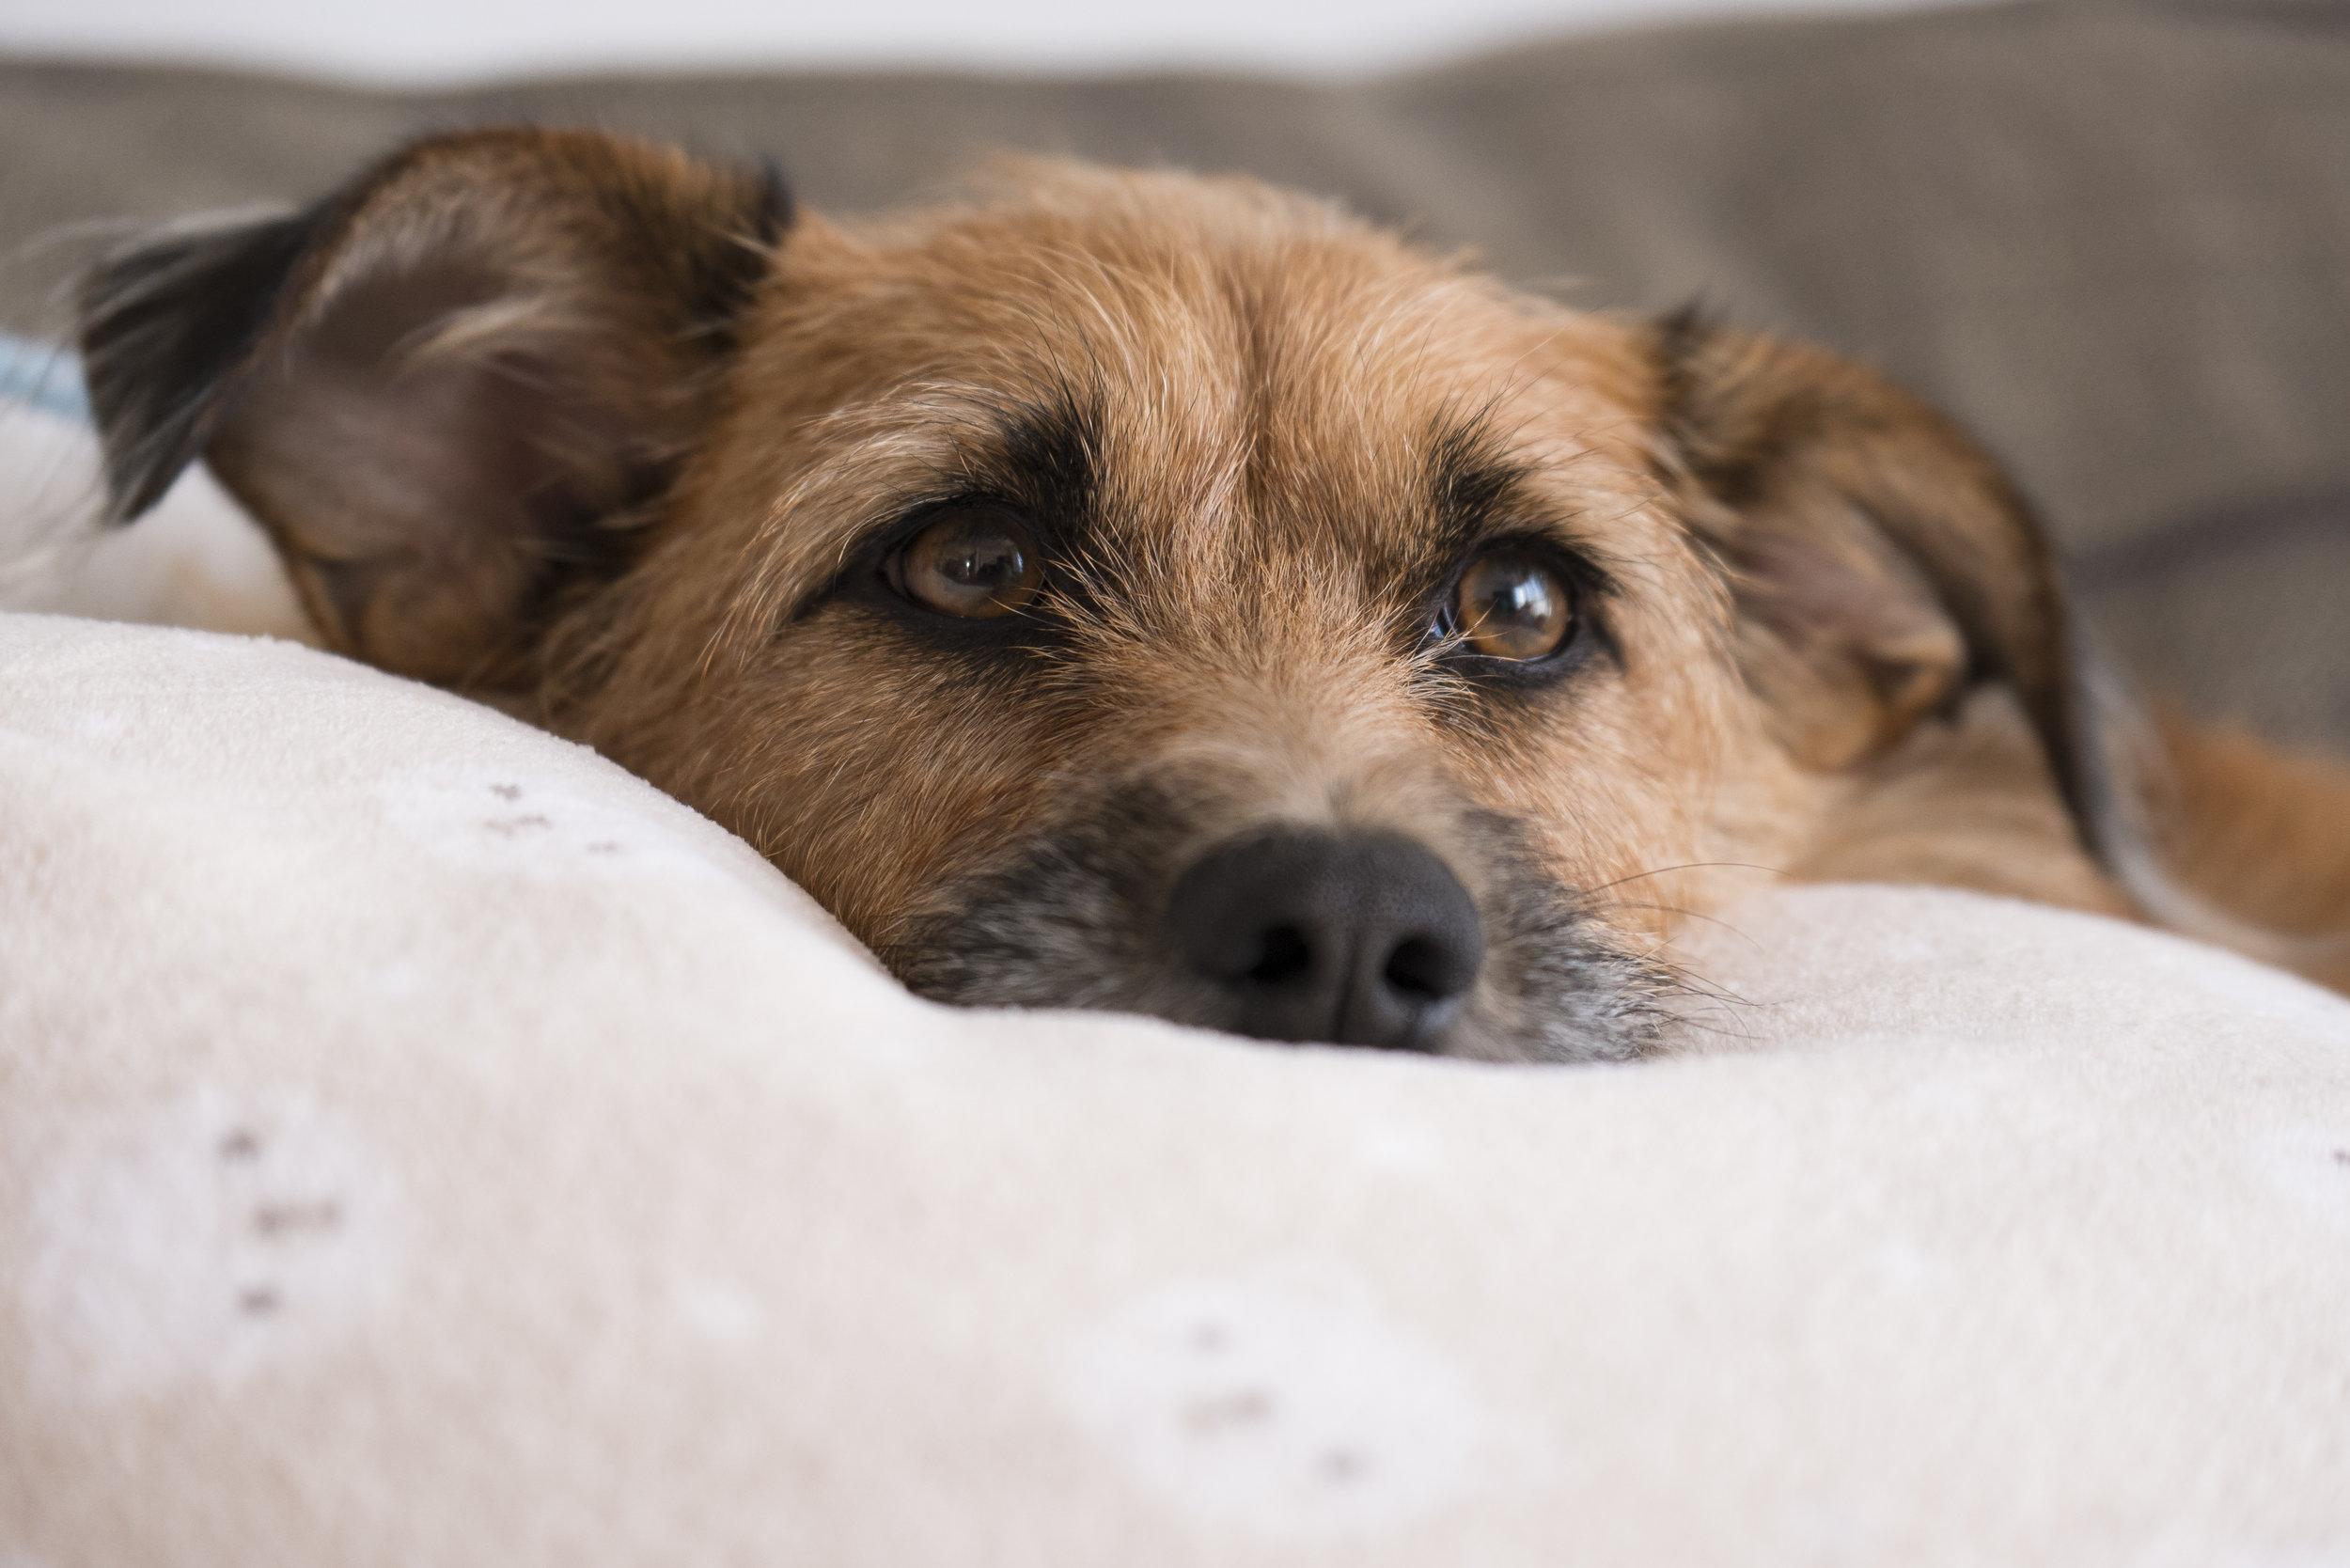 087407519-dog-relaxing-sofa.jpeg